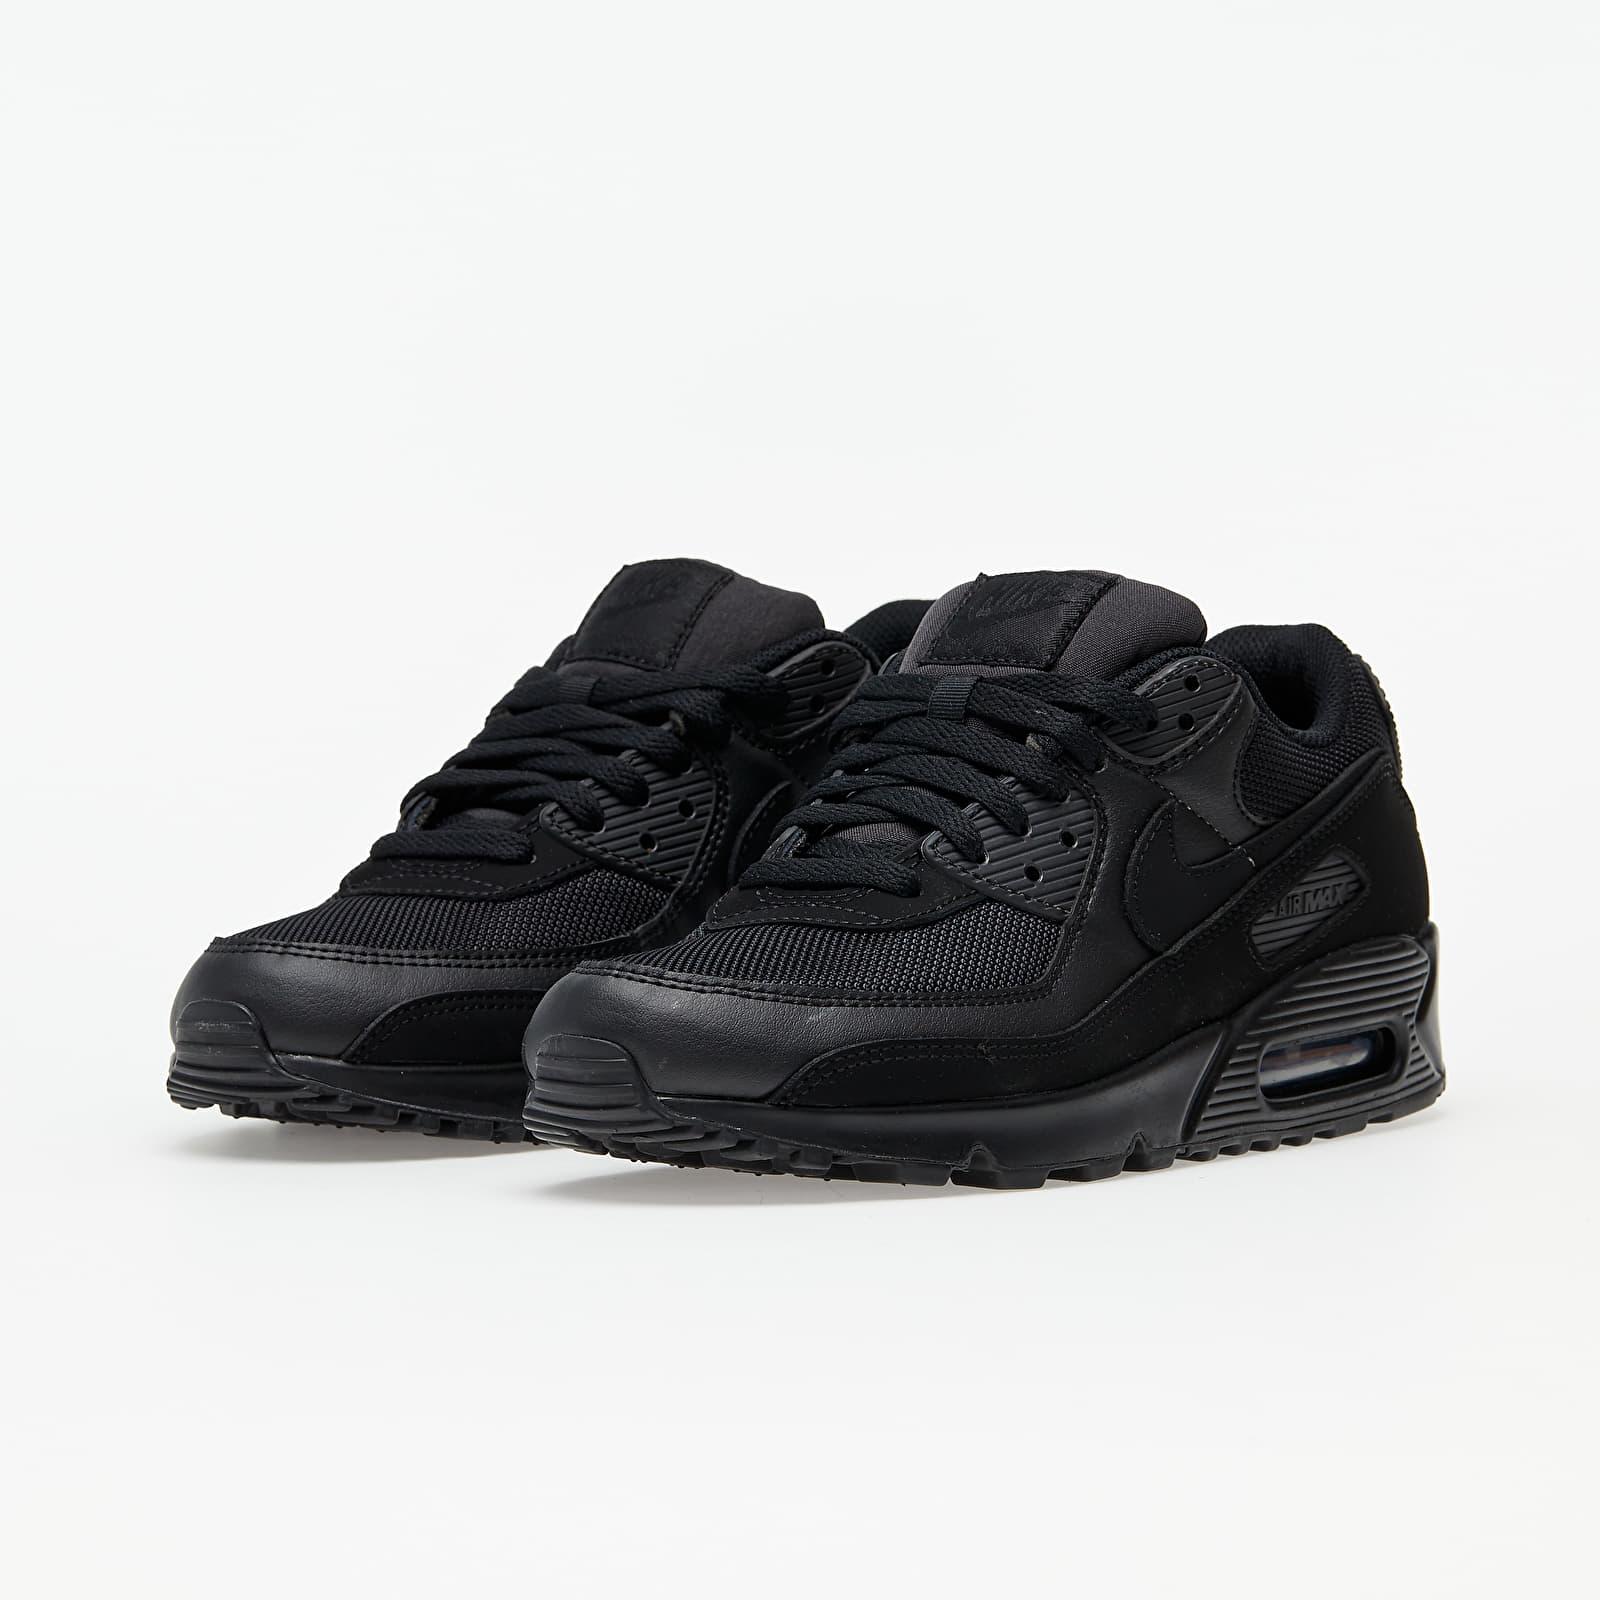 Nike Air Max 90 Black/ Black-Black-White EUR 43